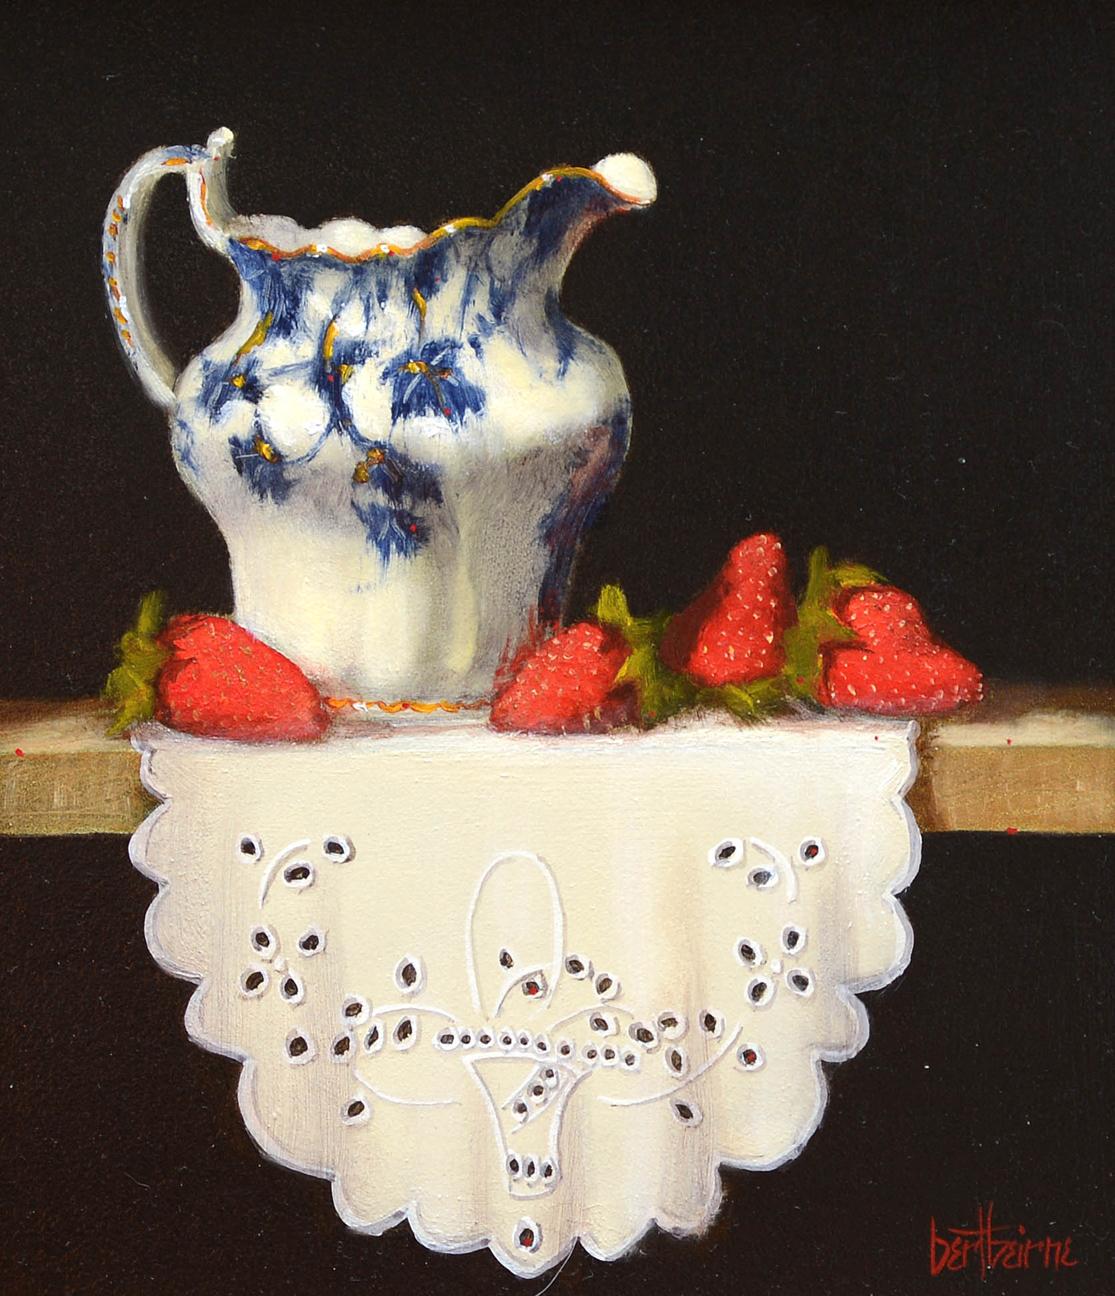 Cake Art Duluth Ga : 2 Smith Art Gallery in Duluth, GA - (404) 996-8...